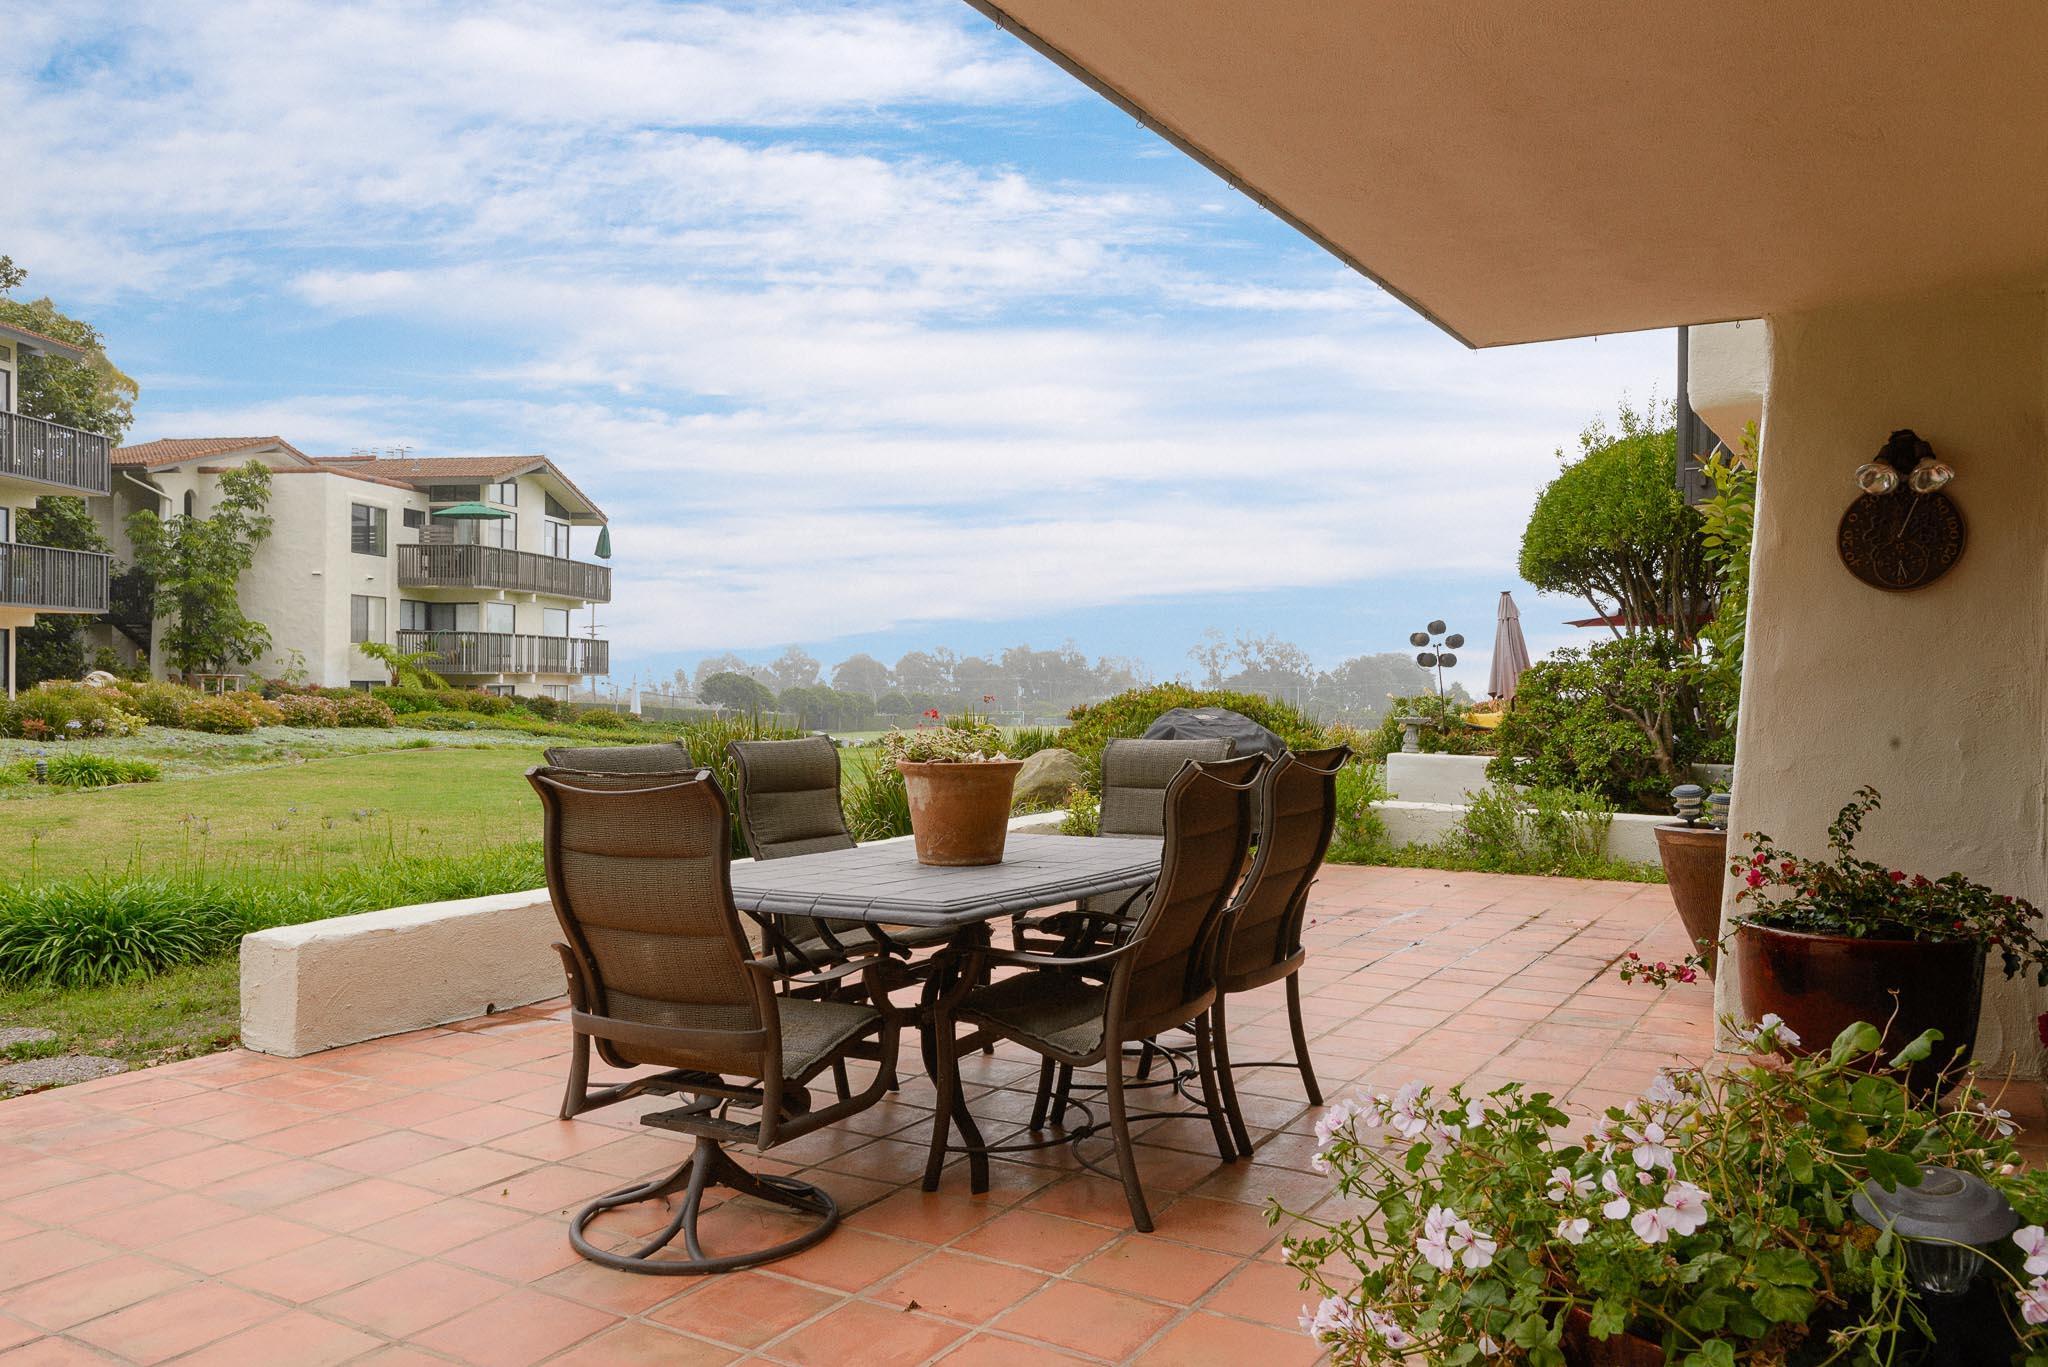 Property photo for 3375 Foothill Rd #411 Carpinteria, California 93013 - 18-1197